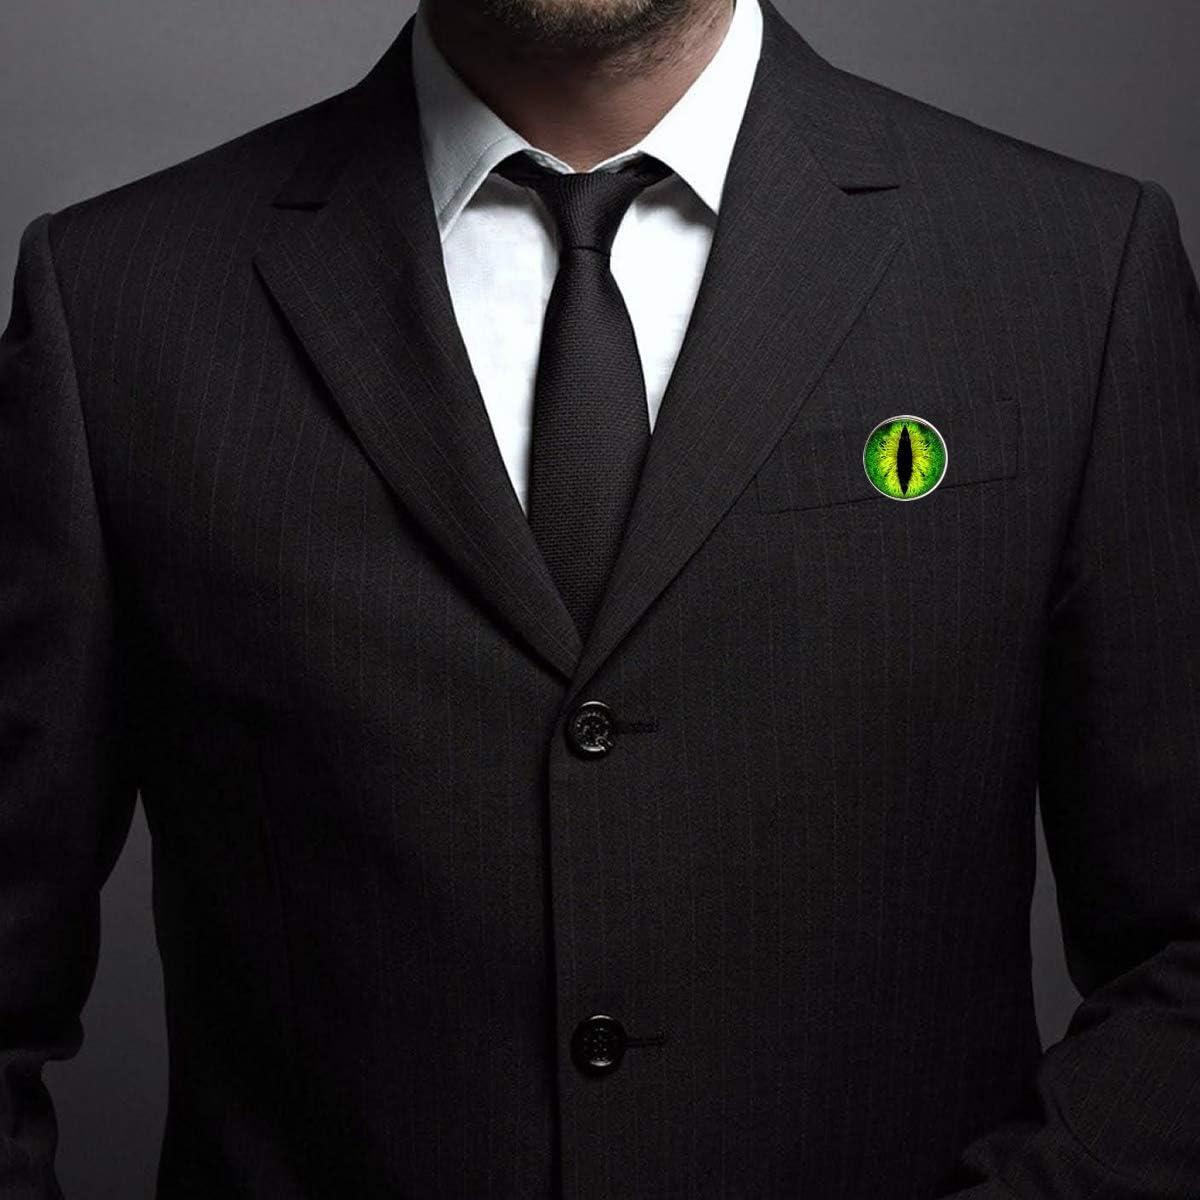 Pinback Buttons Badges Pins Evil Dragon Eye Lapel Pin Brooch Clip Trendy Accessory Jacket T-Shirt Bag Hat Shoe